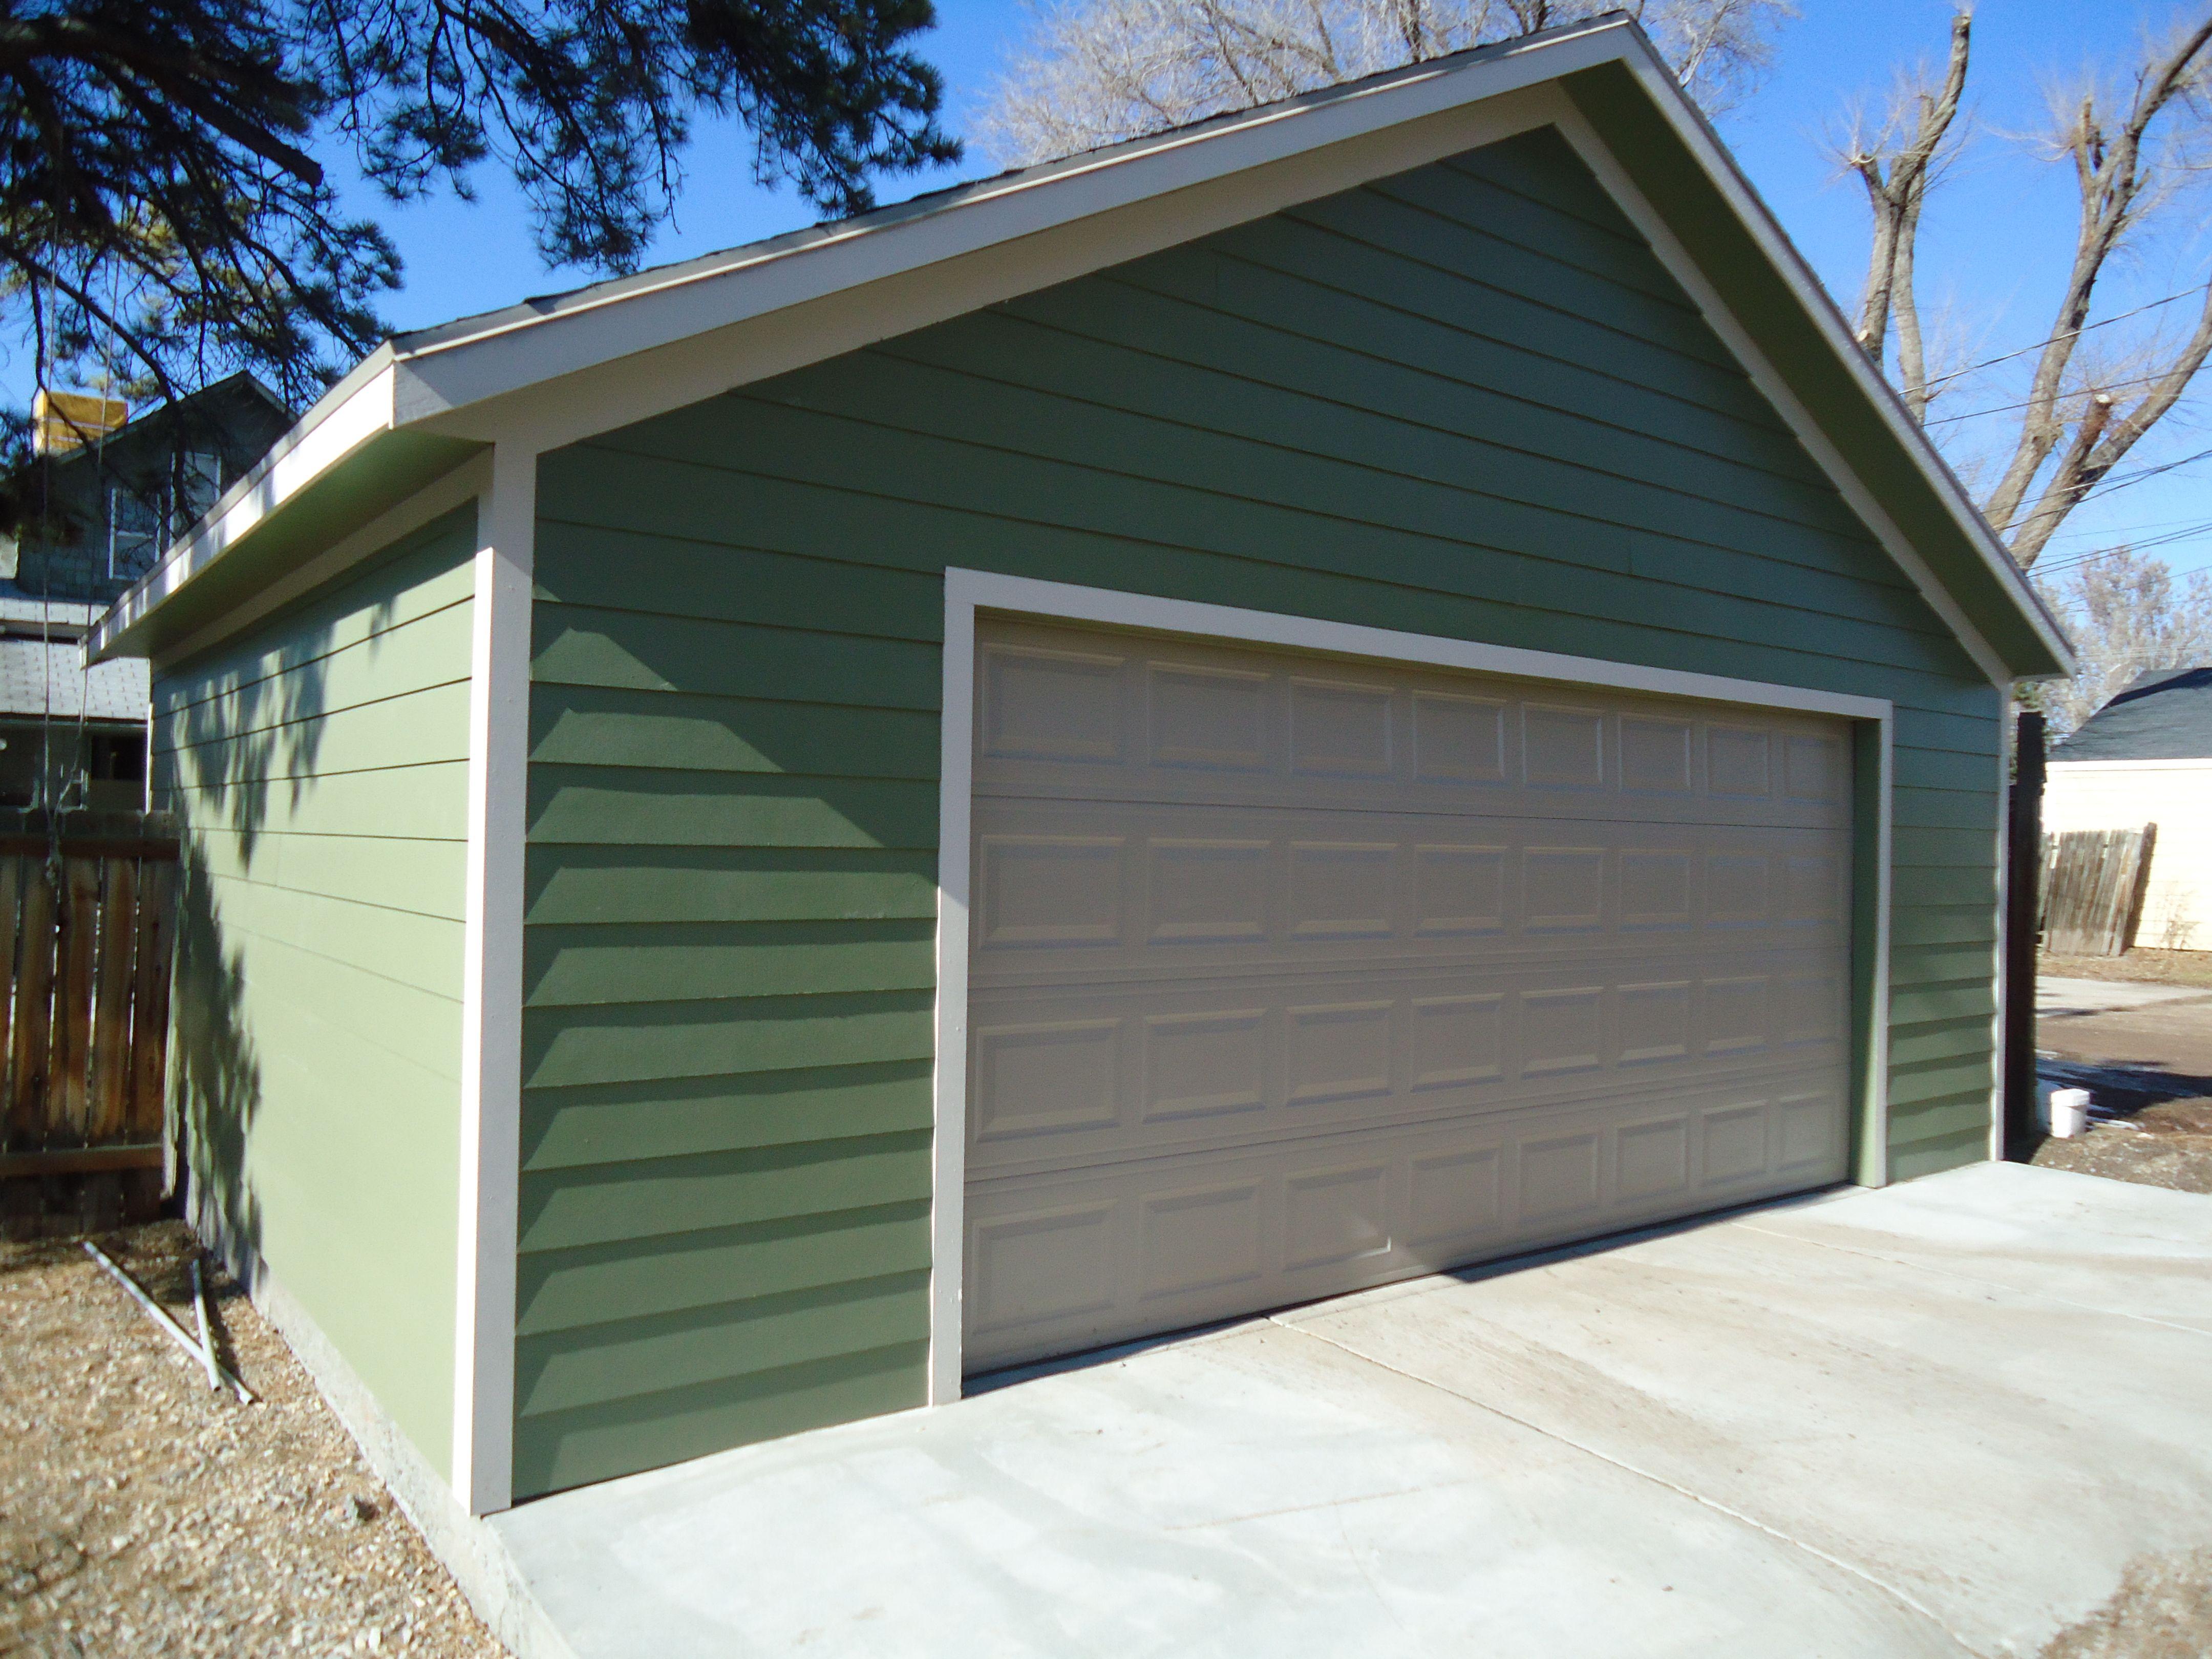 Gallery custom sheds lap siding shed